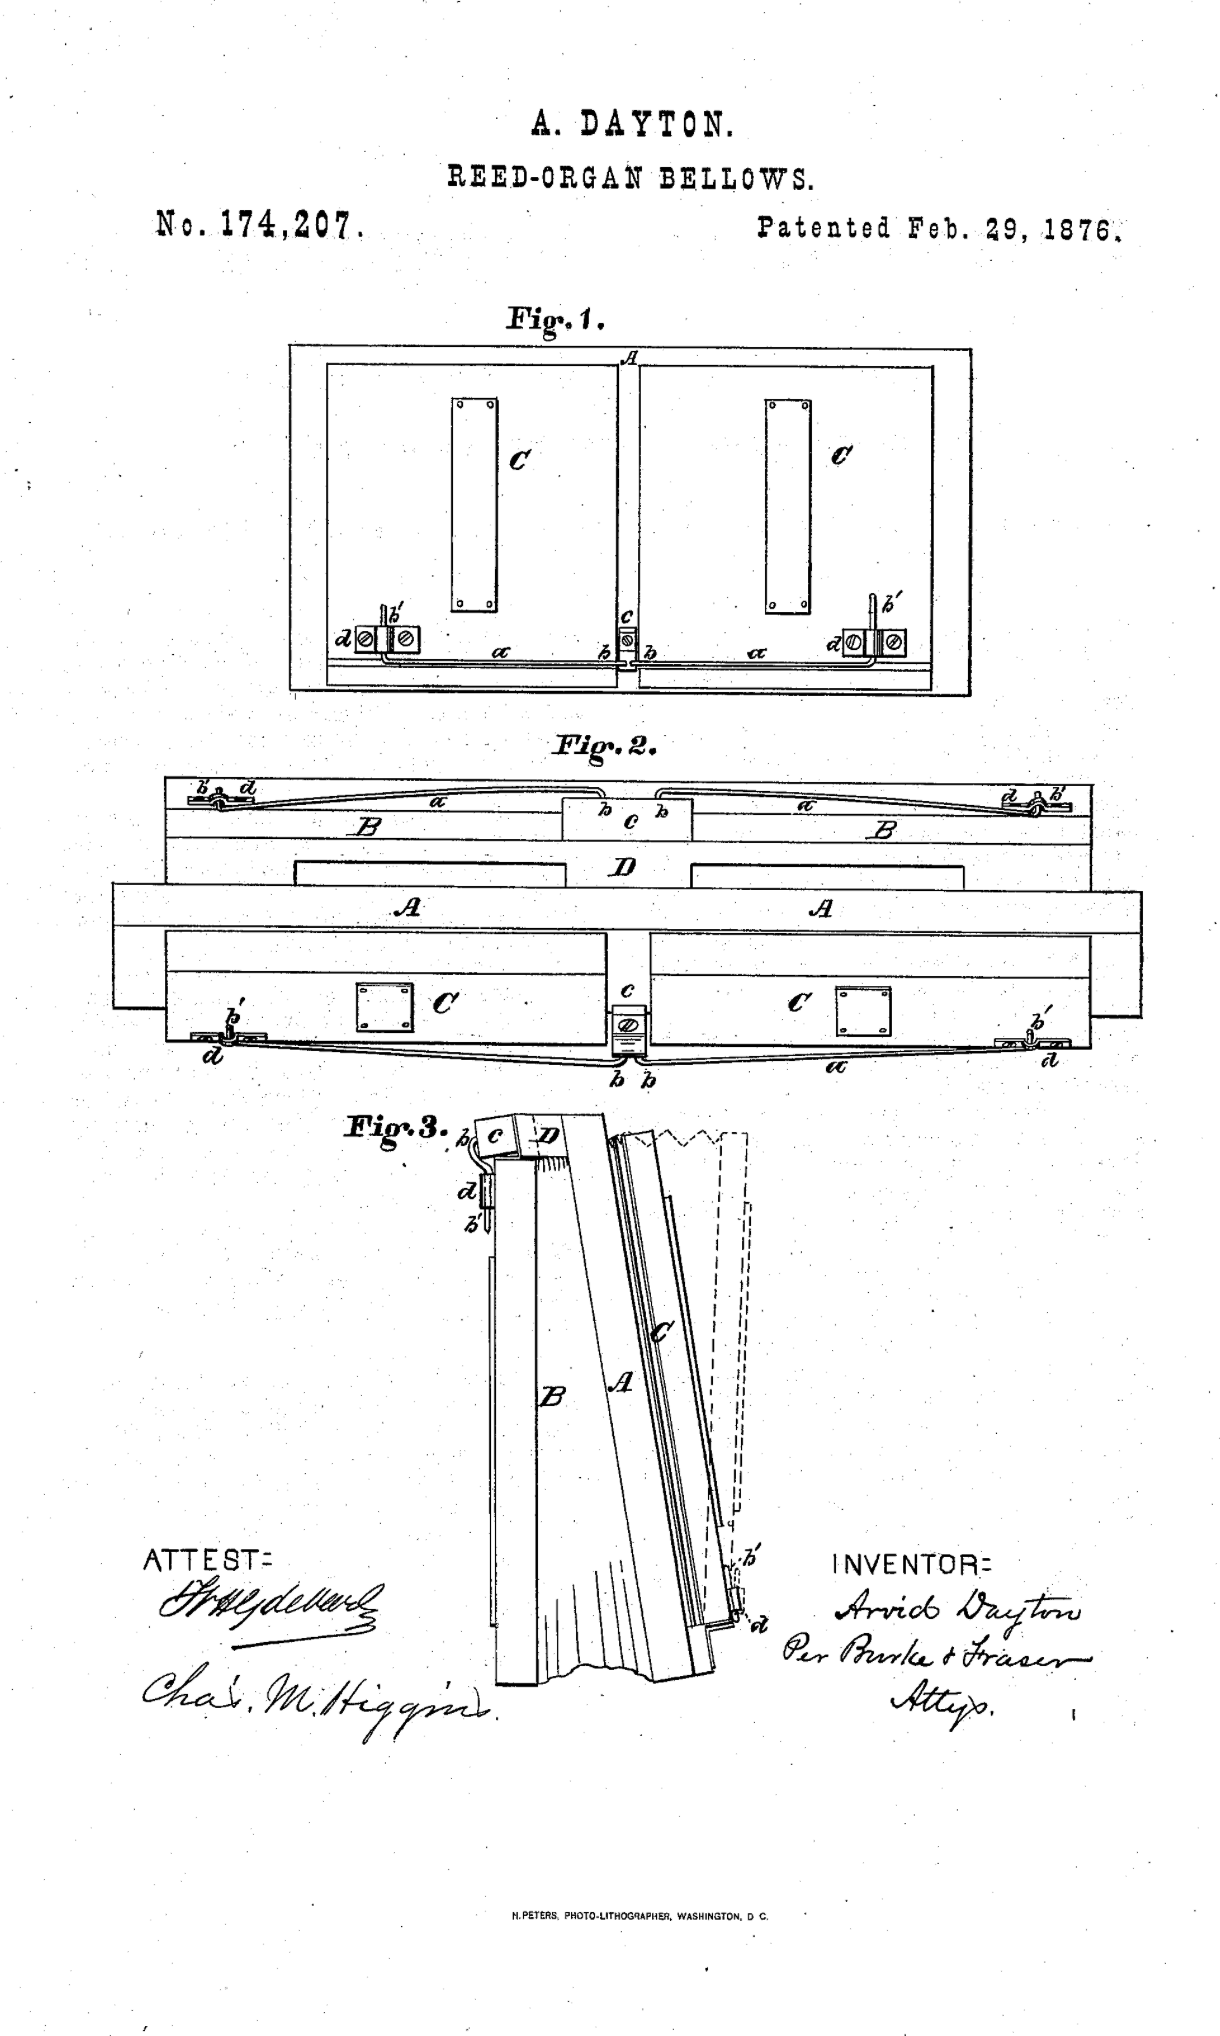 arvid dayton reed organ made in wolcottville torrington connecticut [ 1220 x 2036 Pixel ]